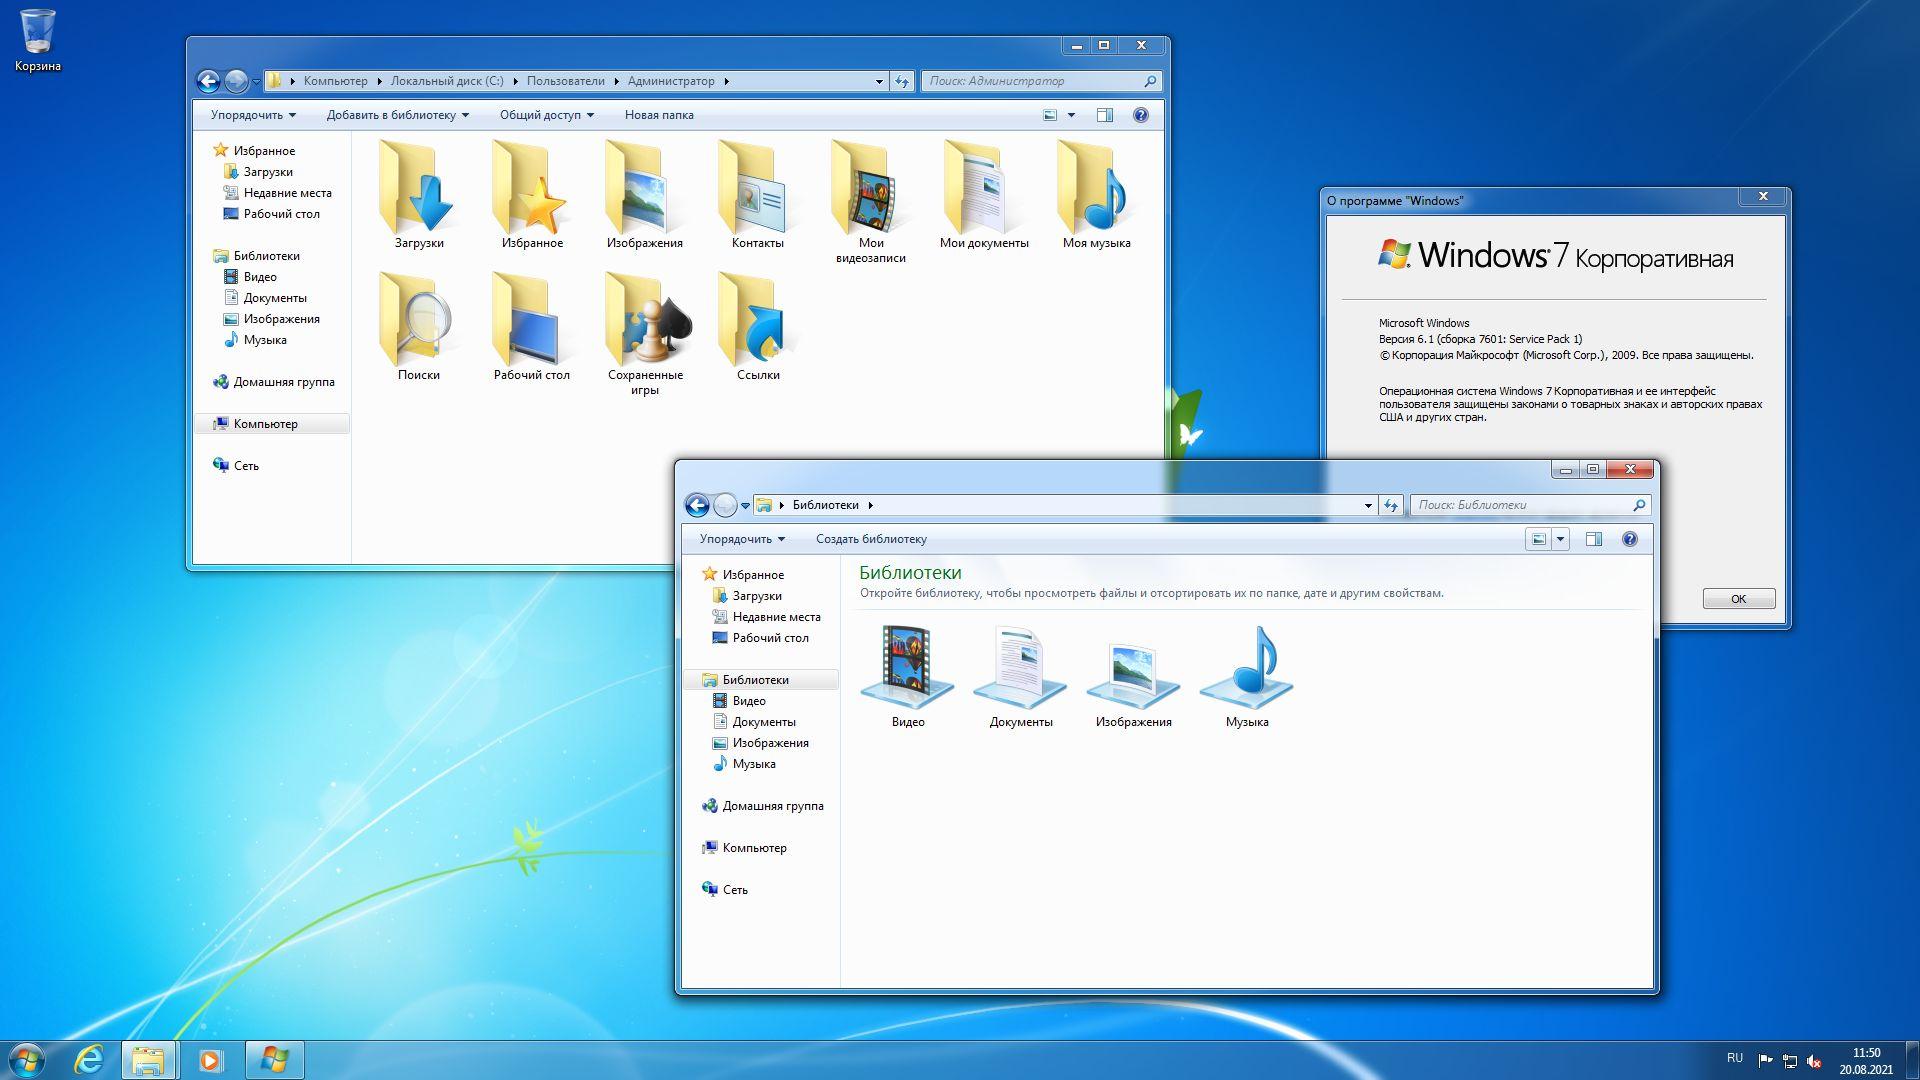 Windows 7 Enterprise SP1 x64 RU [GX 20.08.21]